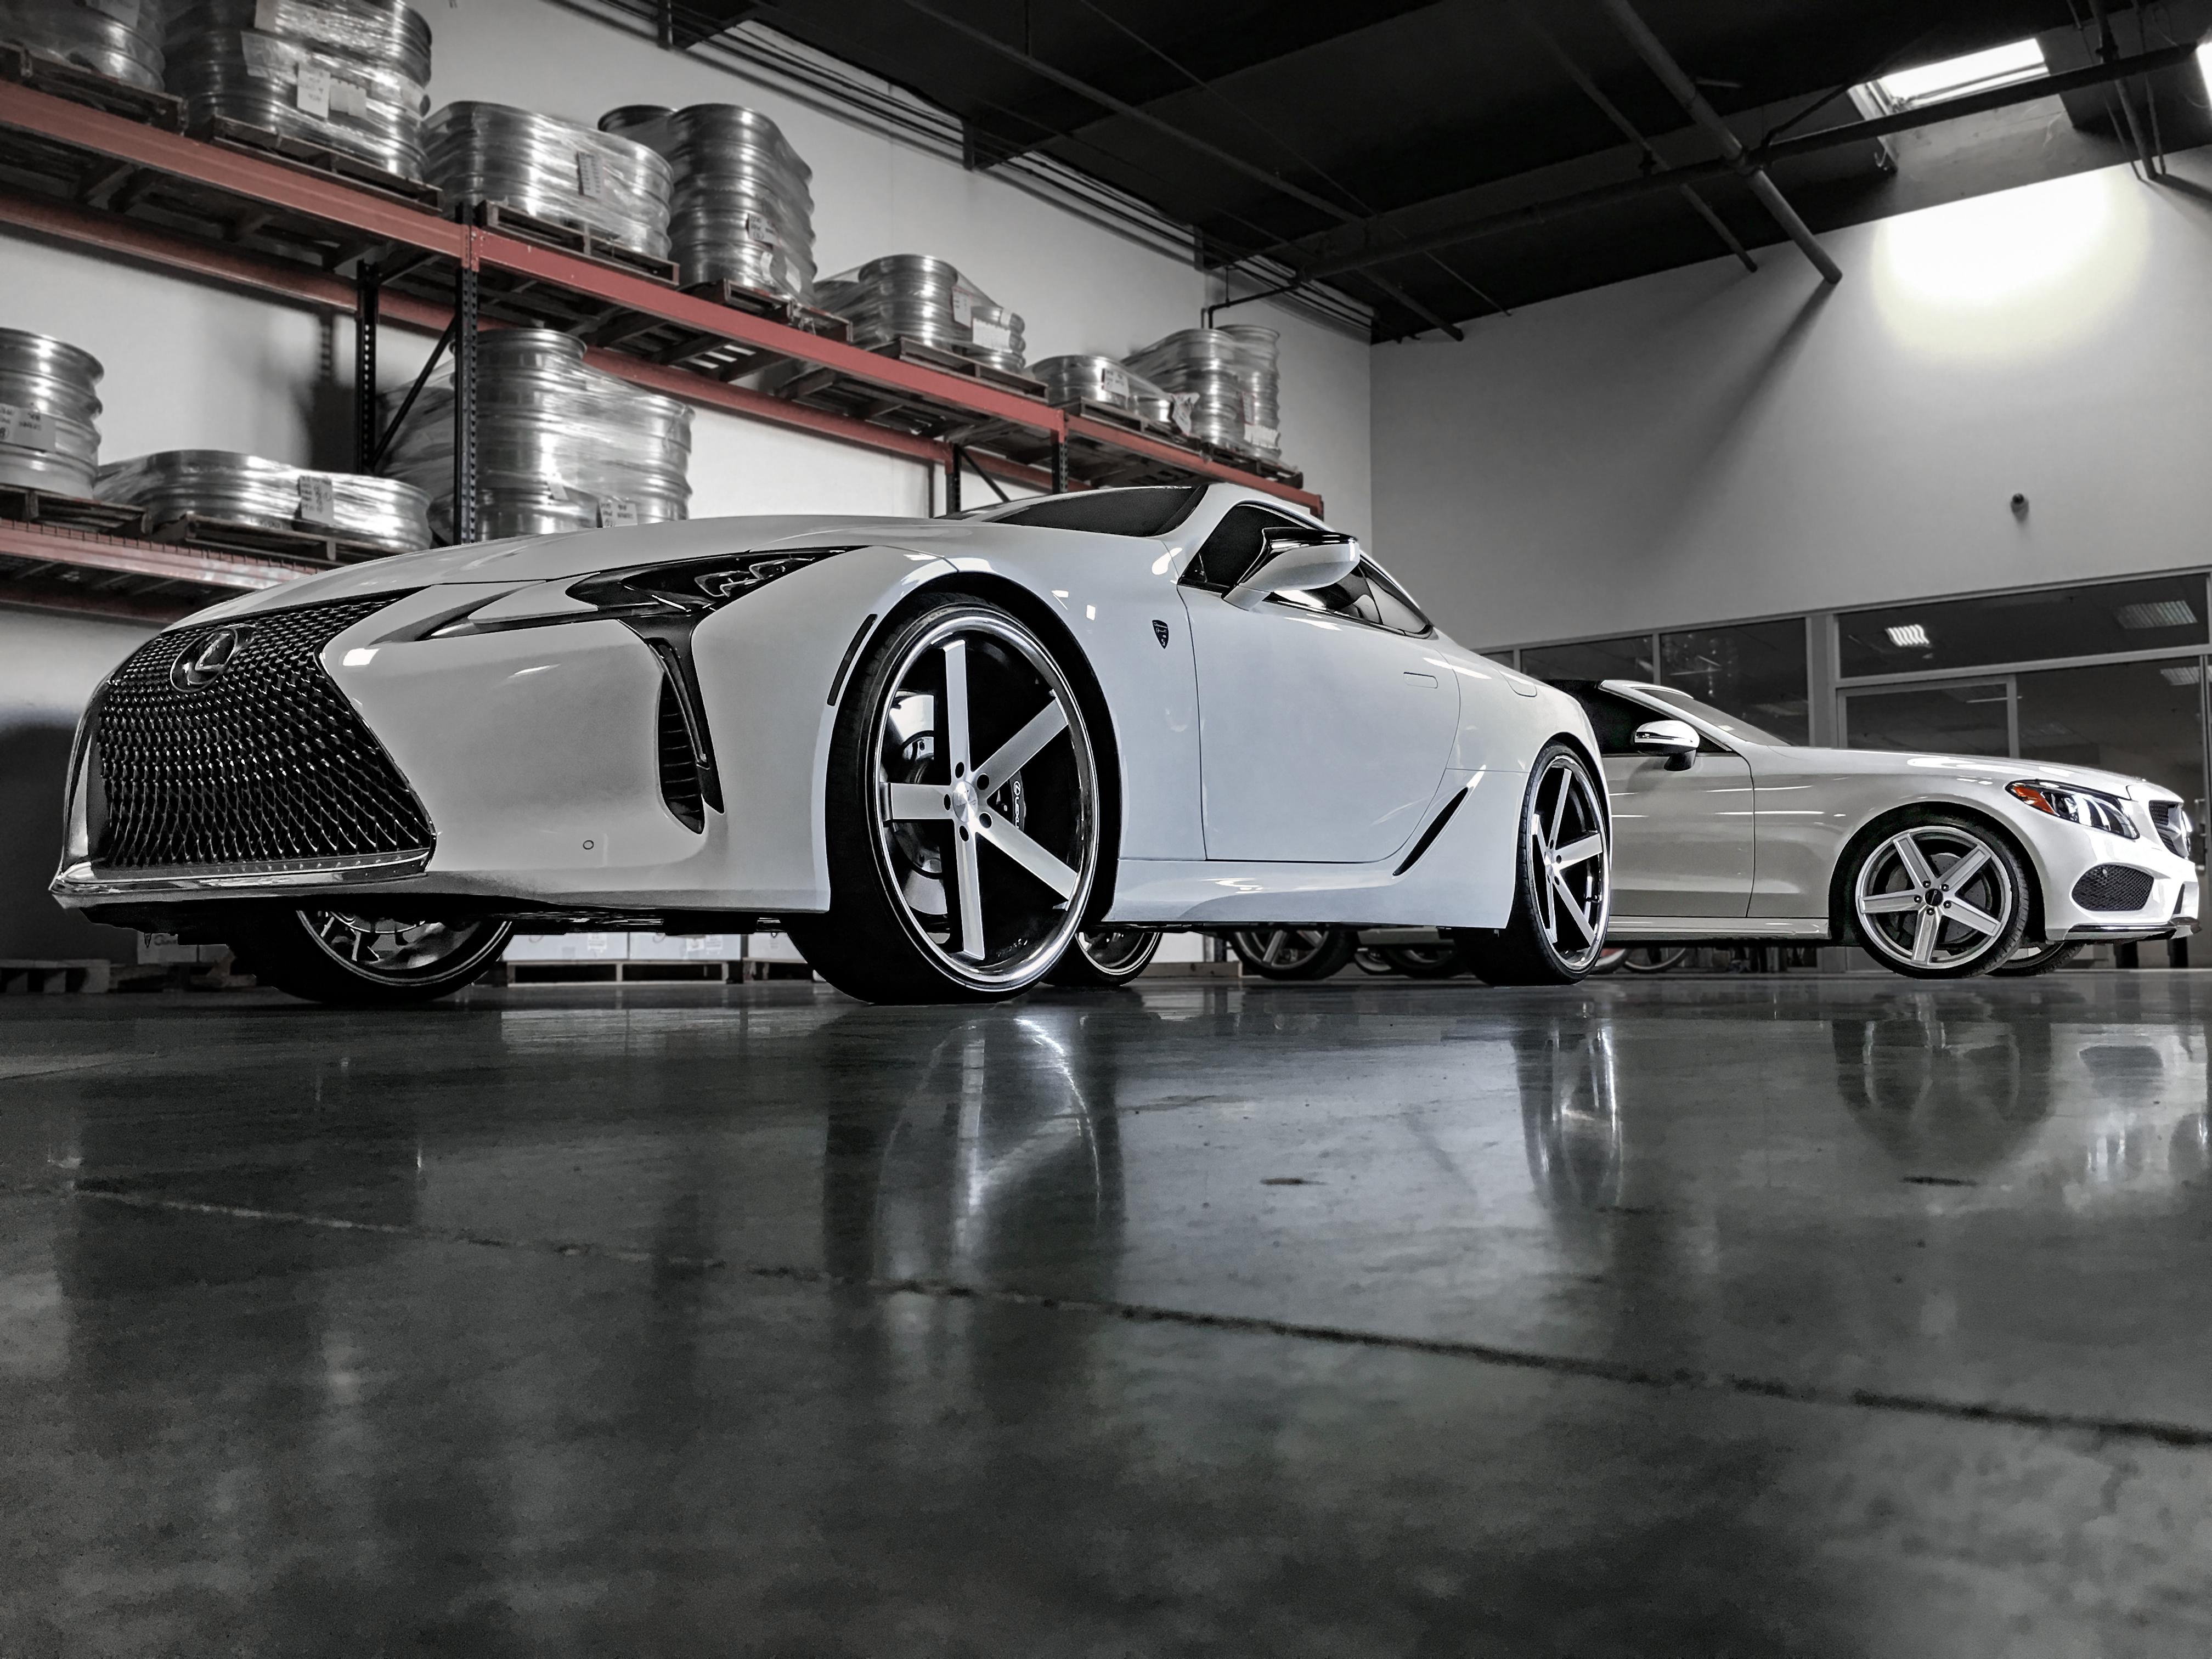 Lexus Lc500 Meccaff 3 Giovanna Luxury Wheels